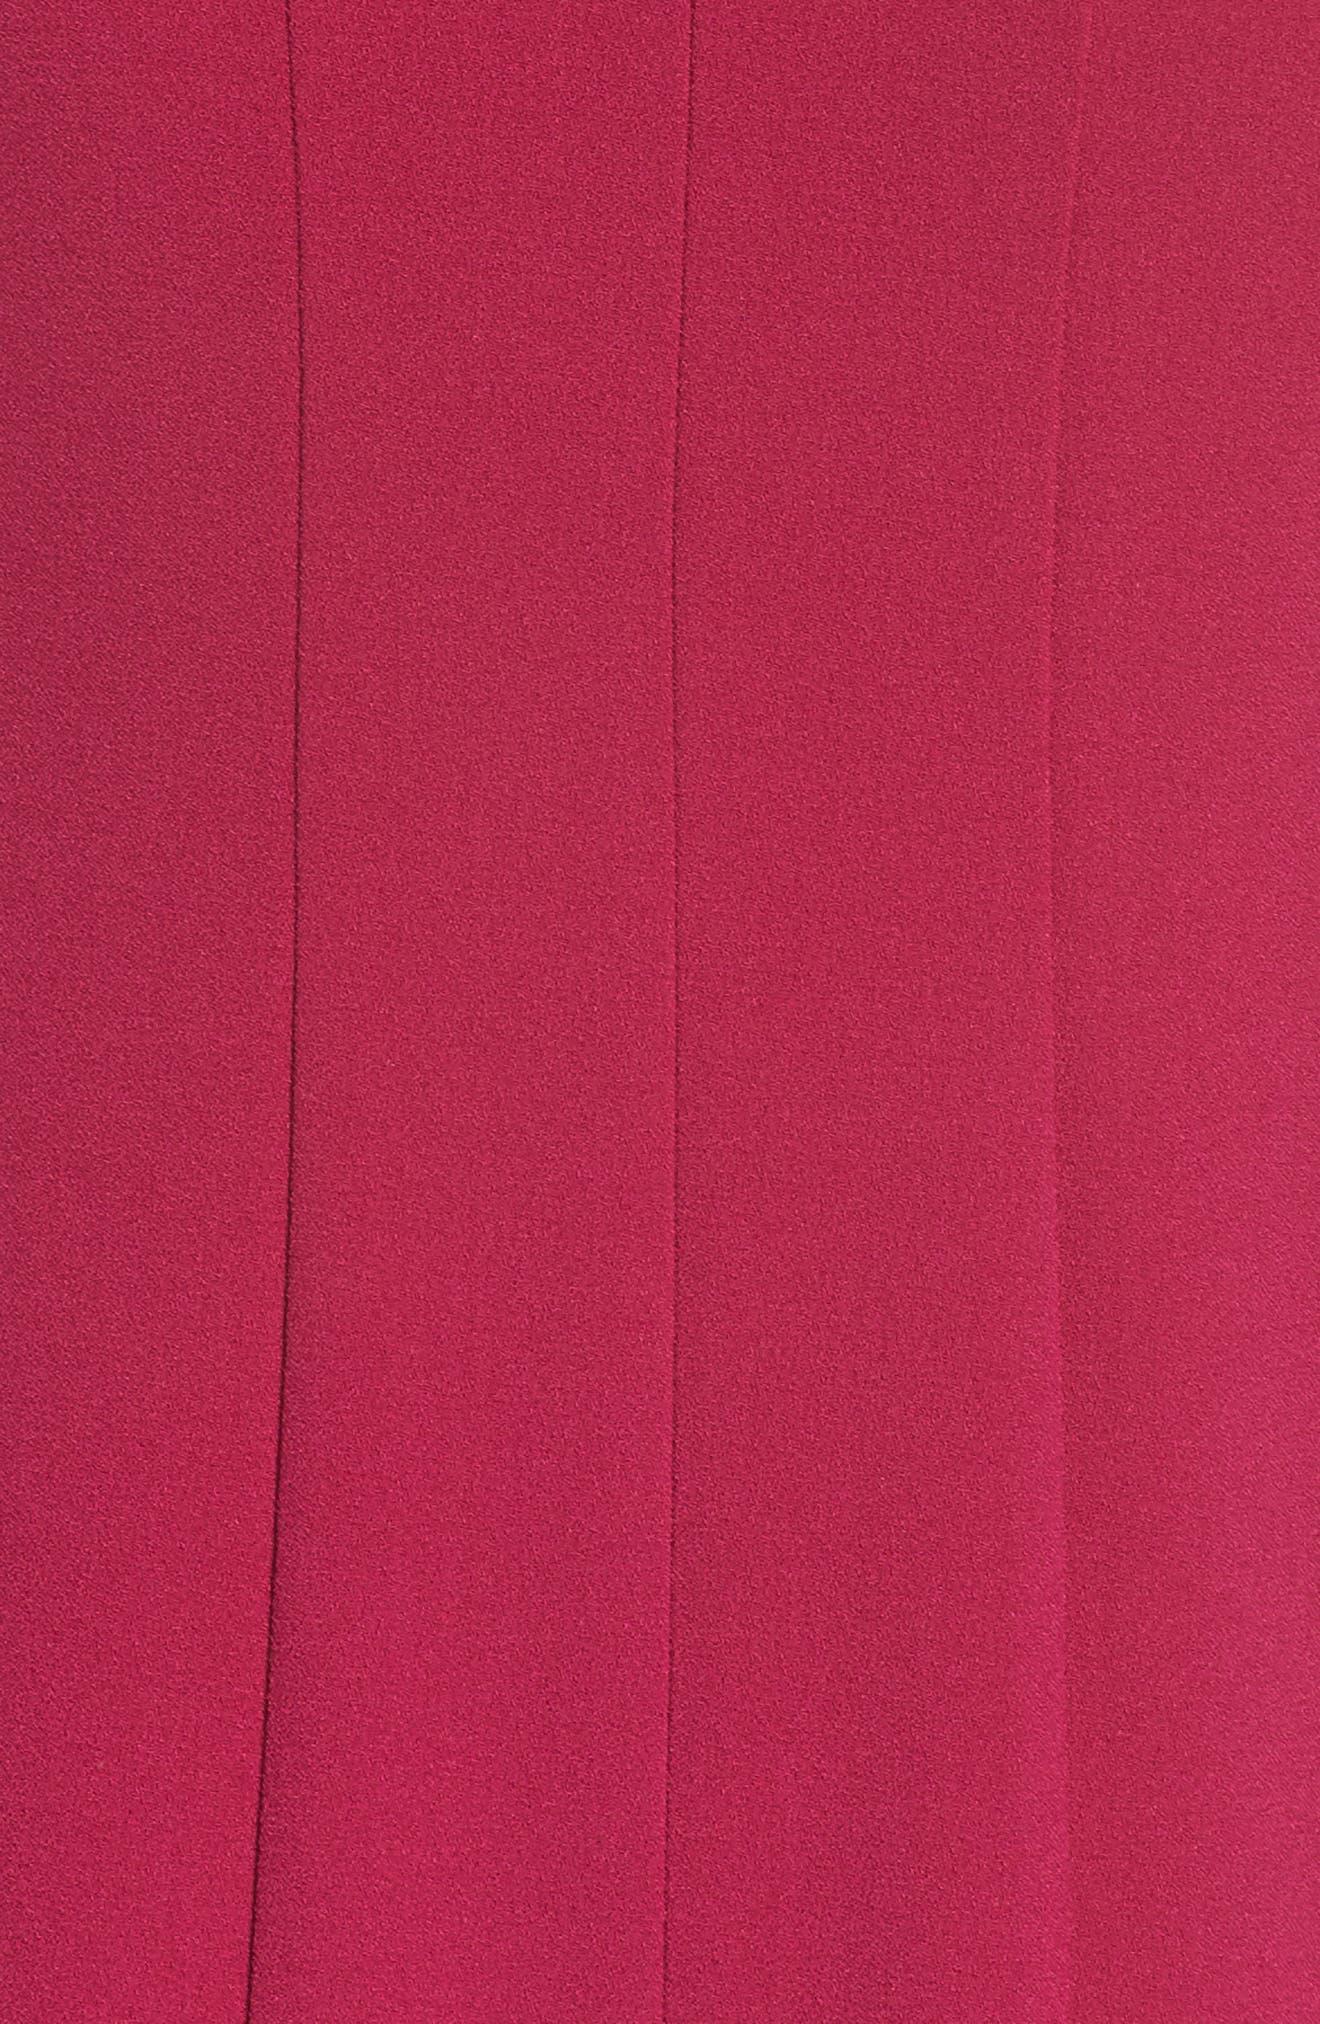 Sleeveless Pleat Panel Fit & Flare Dress,                             Alternate thumbnail 6, color,                             FUCHSIA